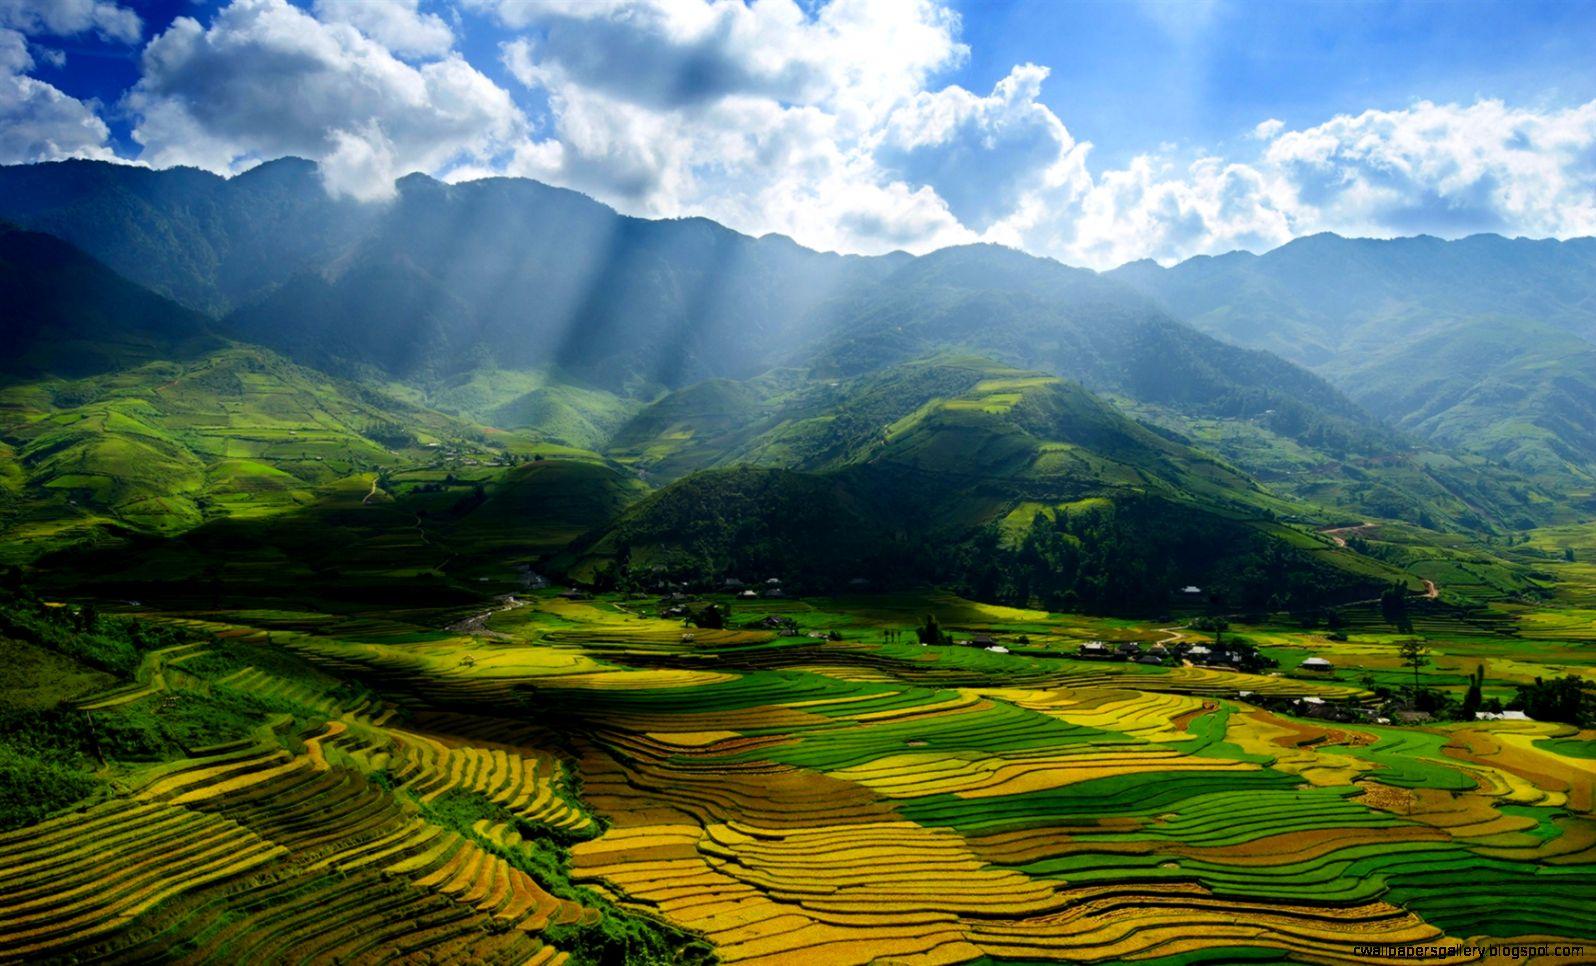 Vietnam Yen Bai Province beautiful scenery valley fields